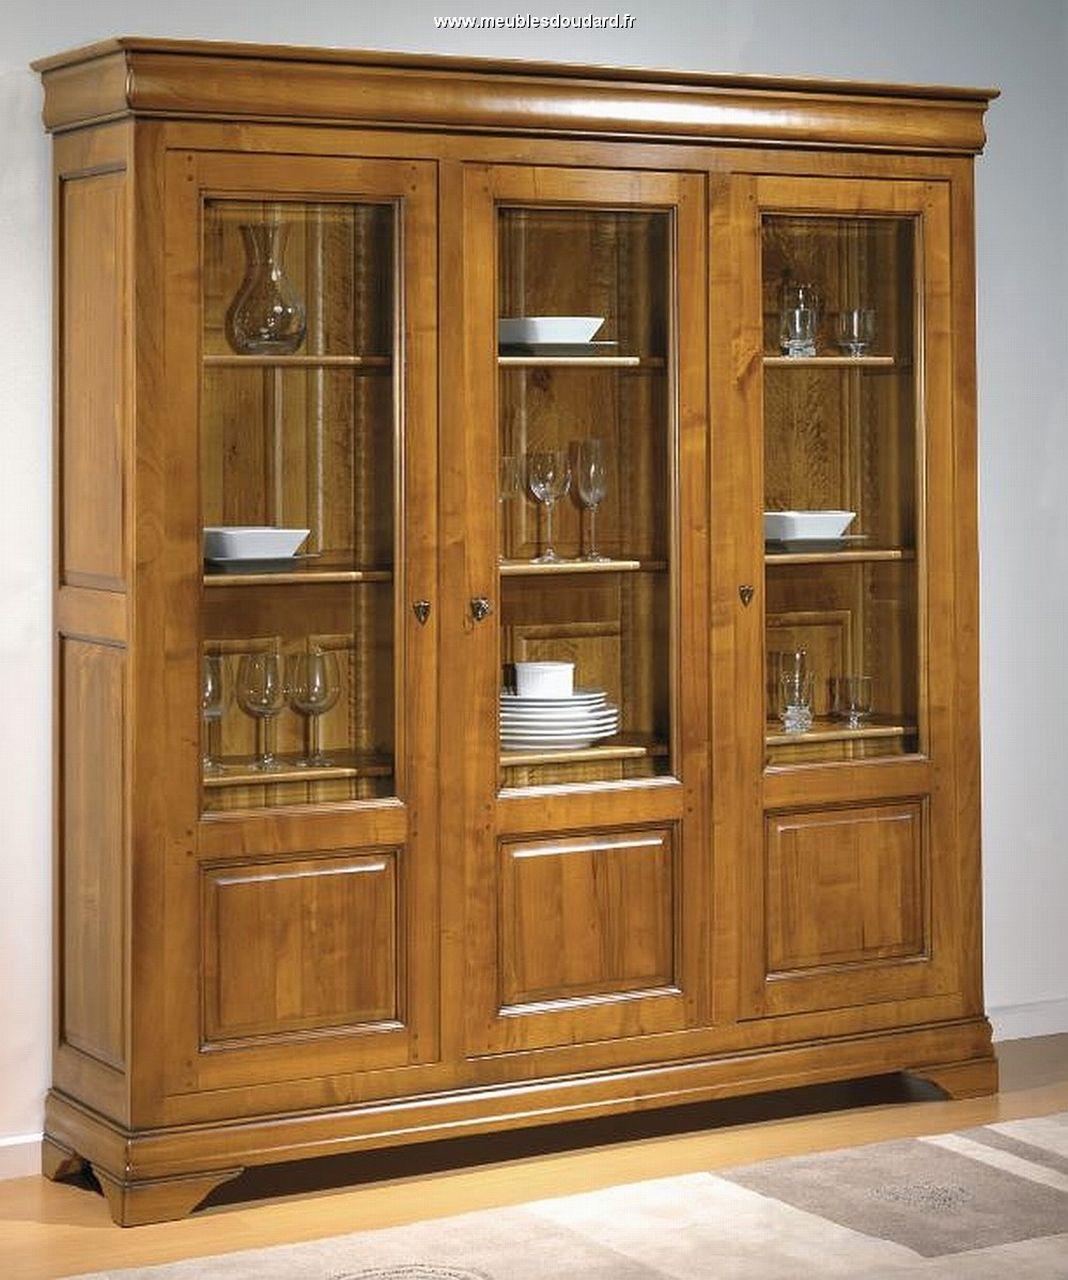 Bibliothque Merisier Armoire Bibliothque Meuble De